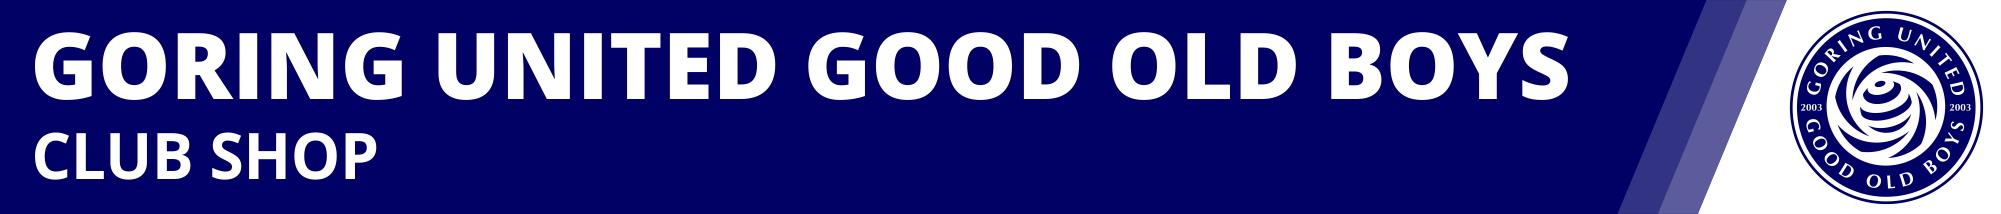 goring-united-good-old-boys-club-shop-banner.png